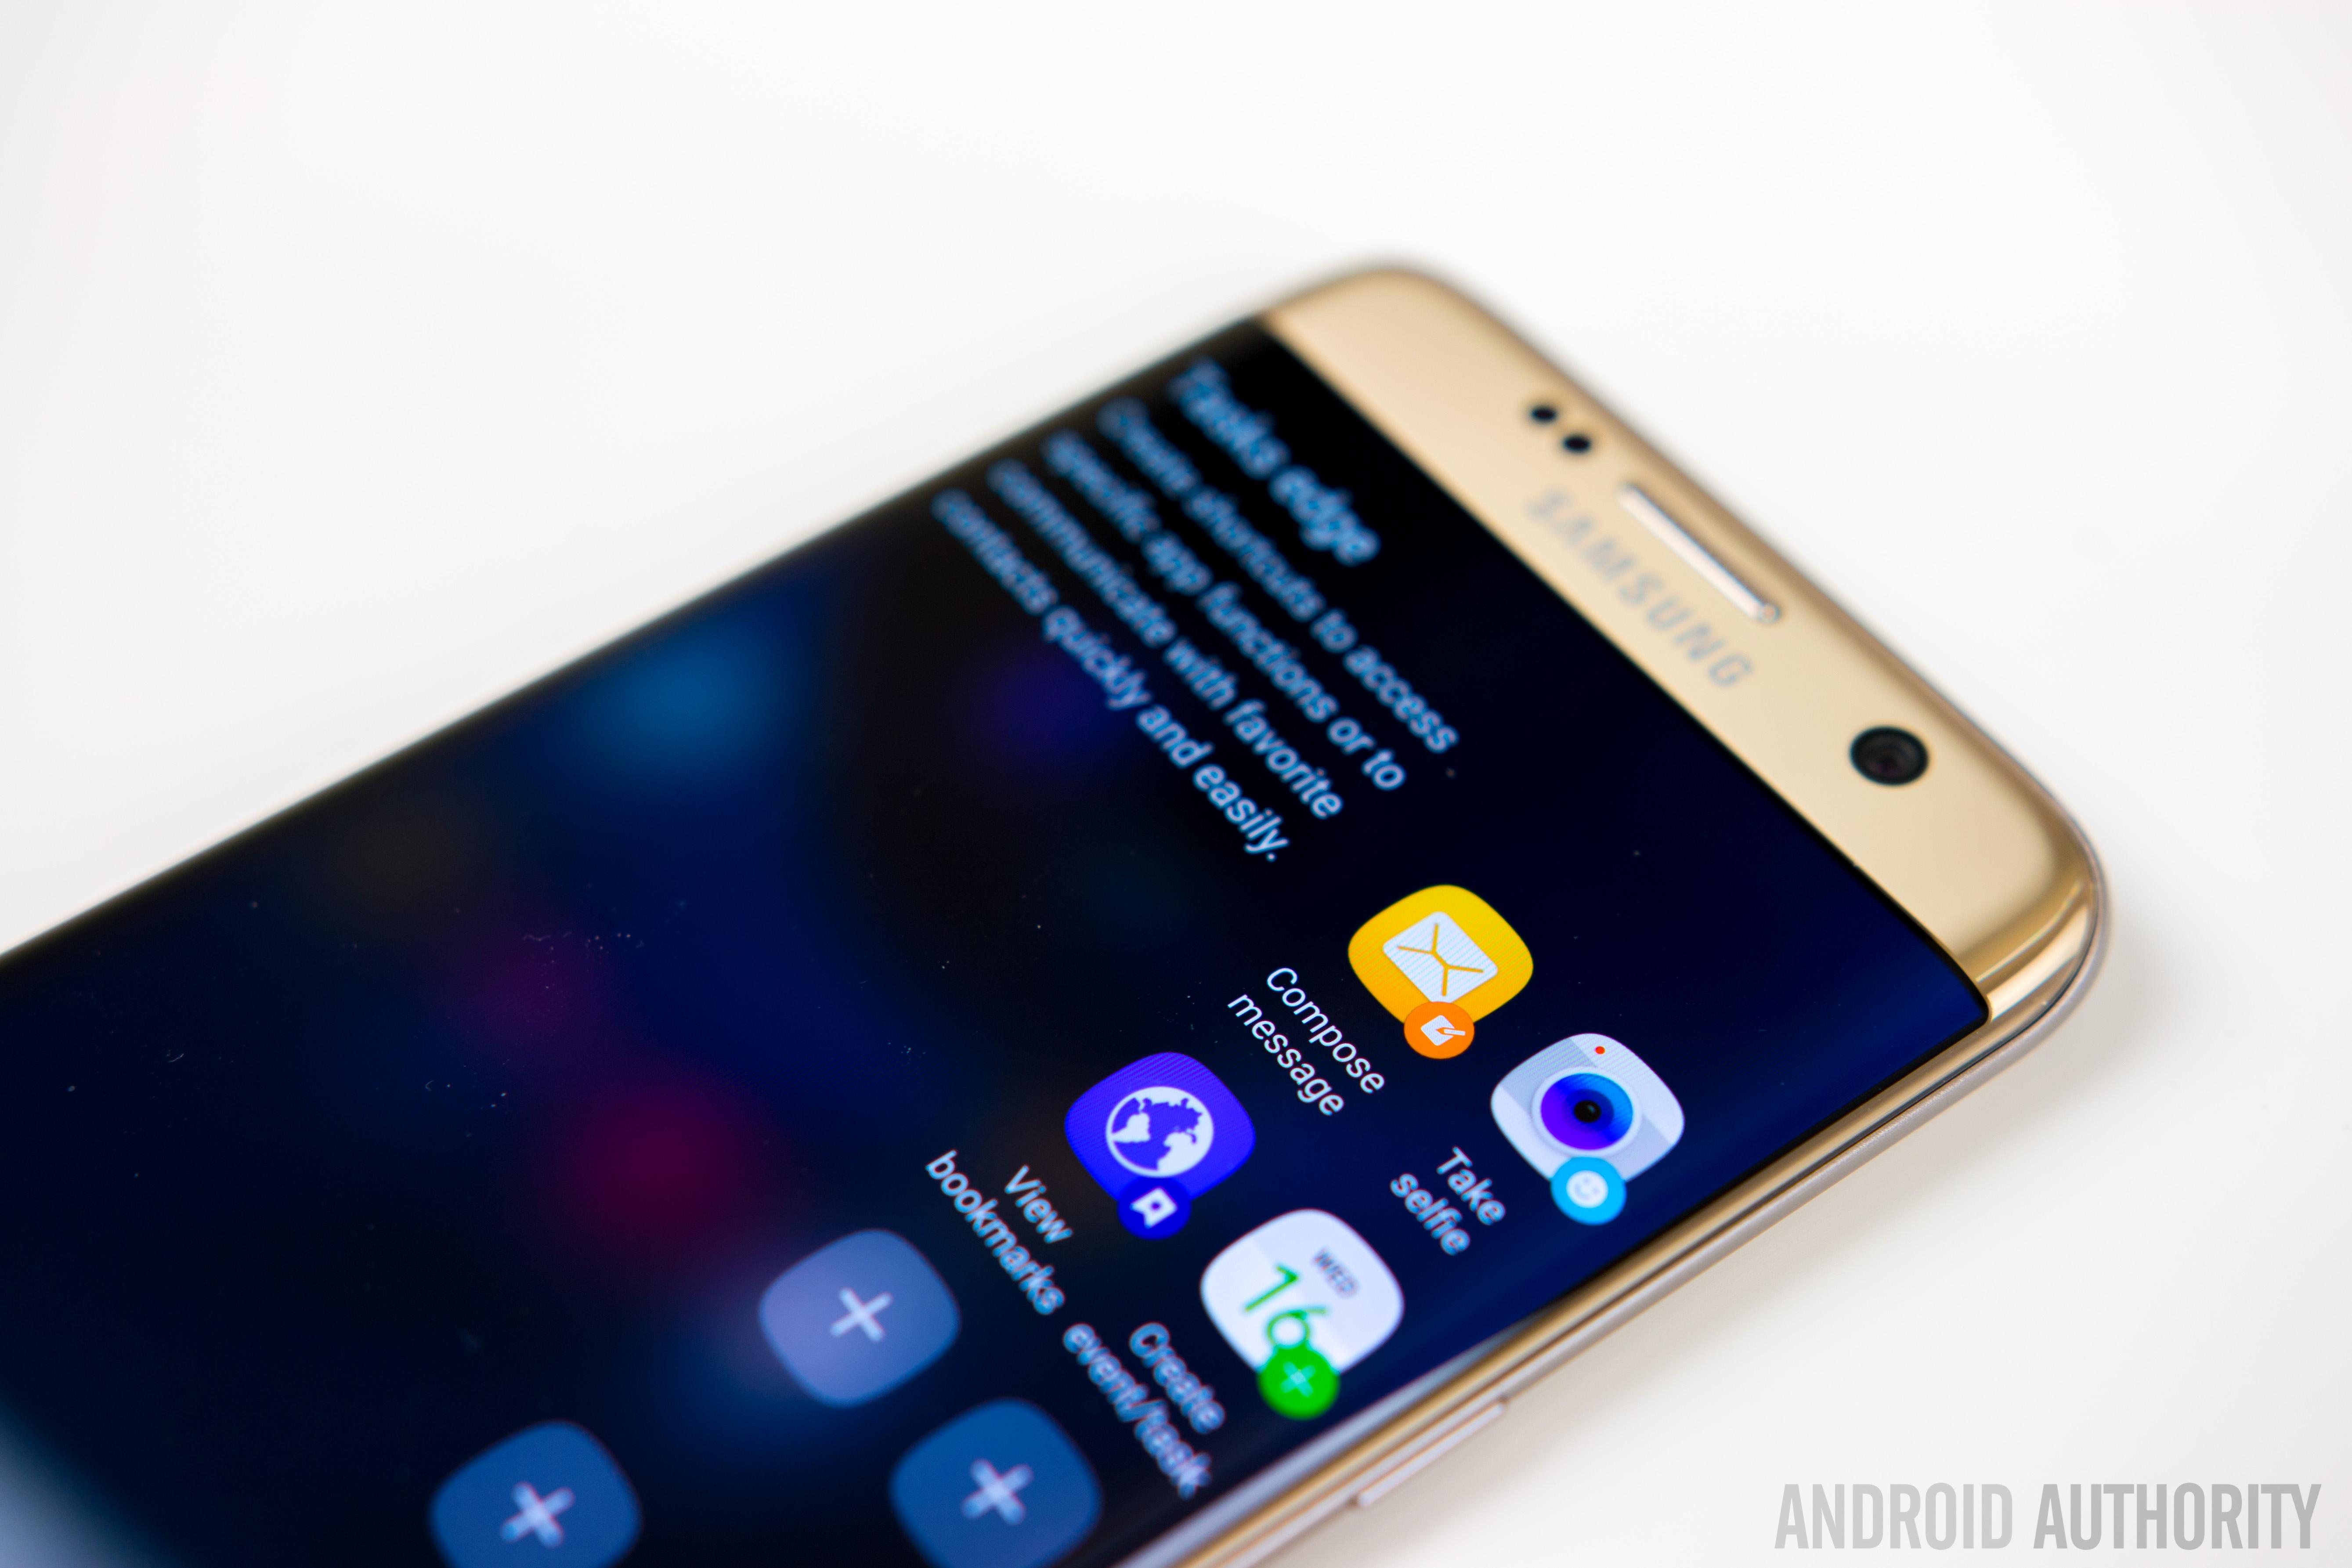 Samsung Galaxy S7 Edge Touchwiz-6